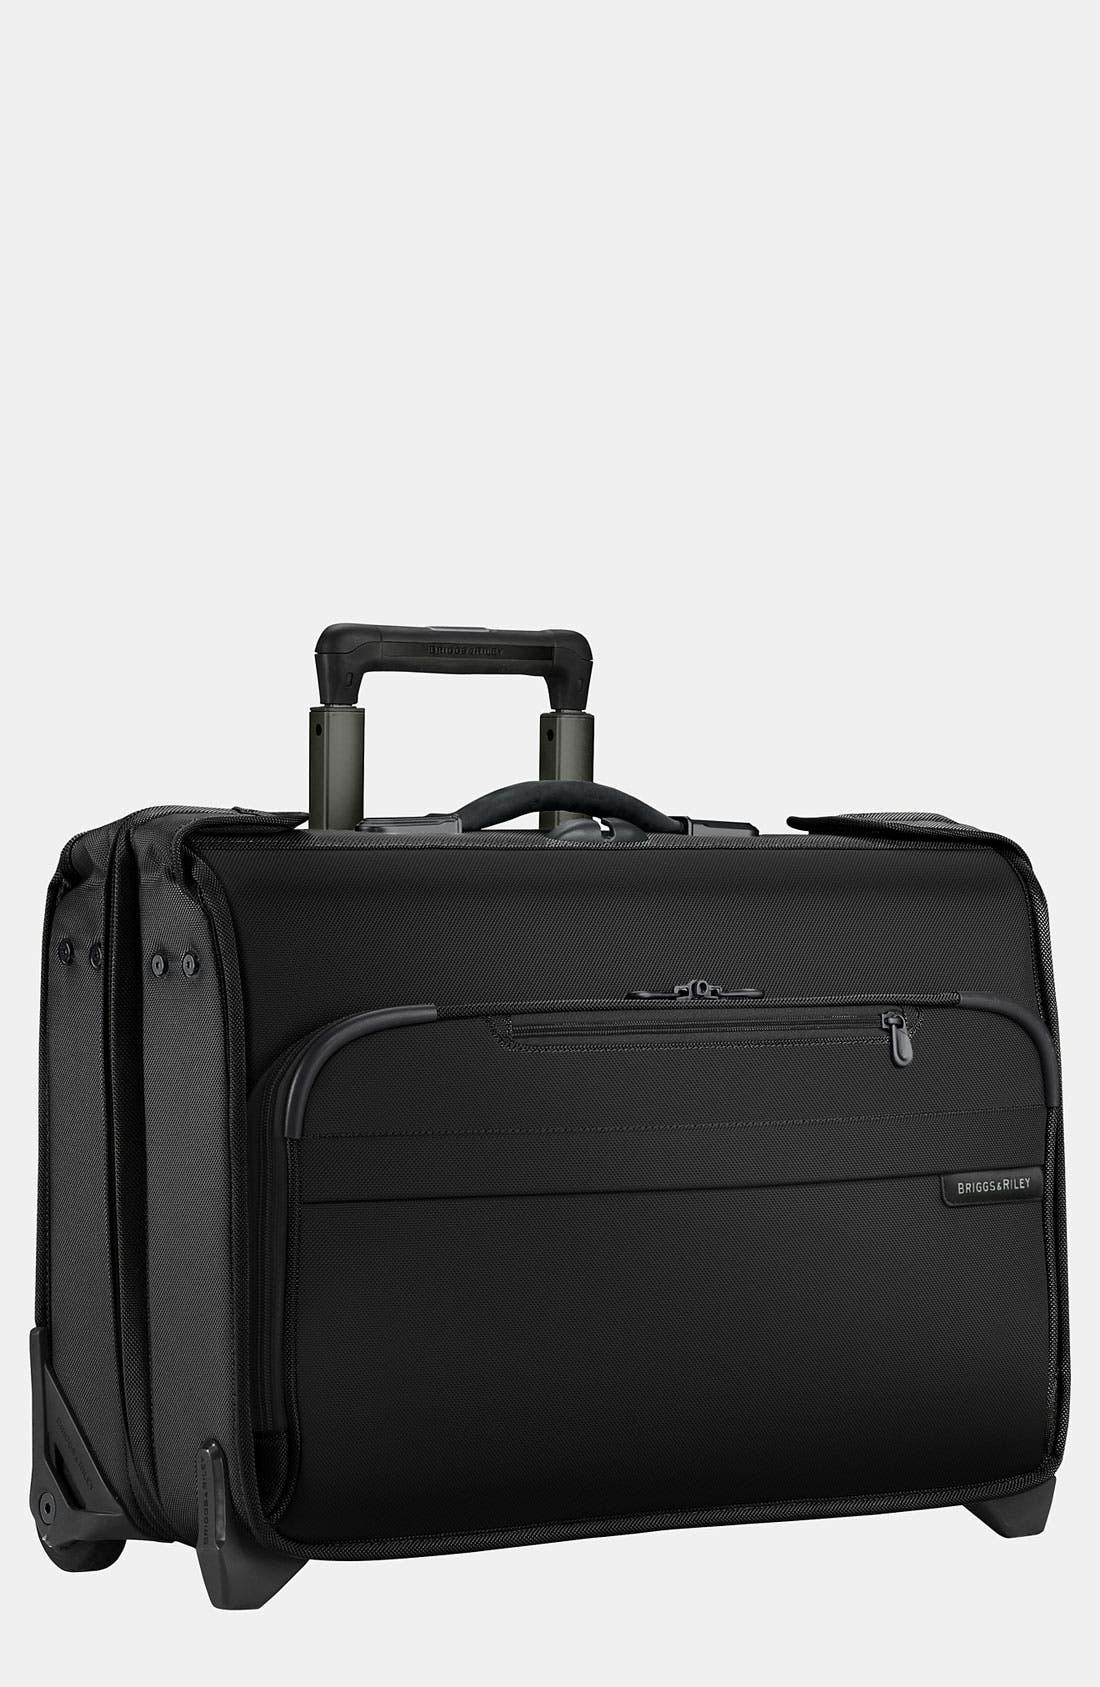 Baseline 21-Inch Wheeled Carry-On Garment Bag